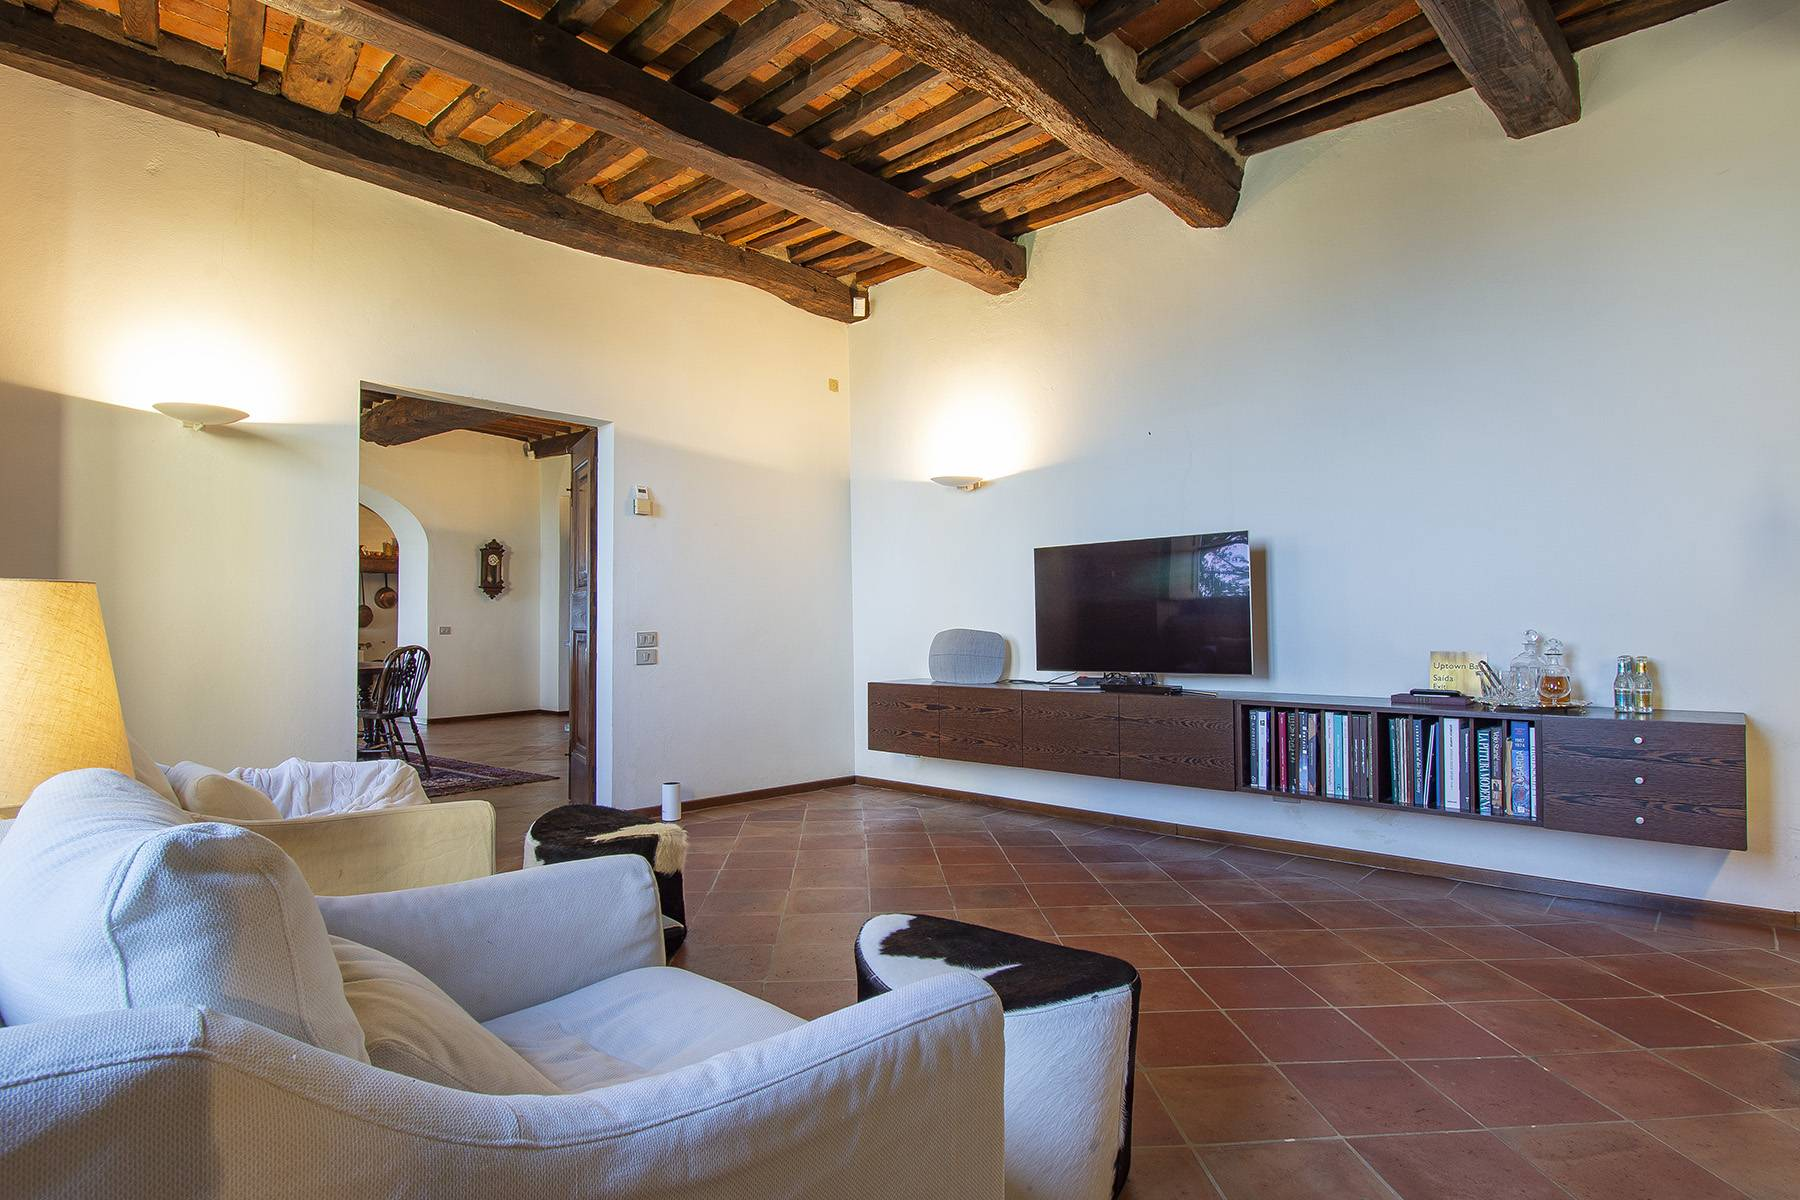 Villa in Vendita a Capannori: 5 locali, 380 mq - Foto 6